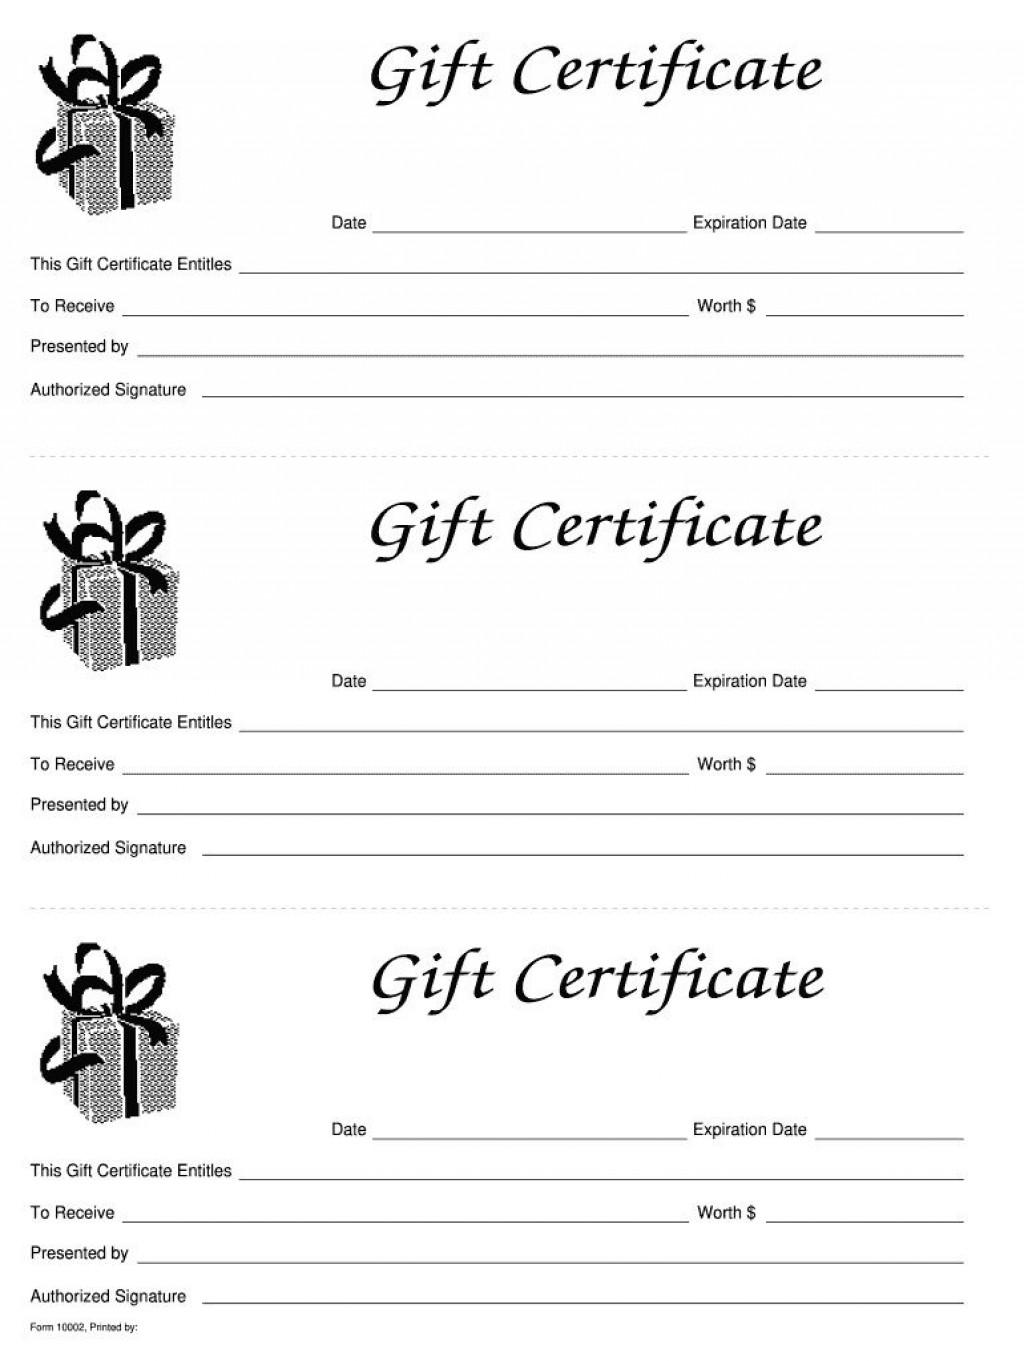 007 Marvelou Printable Gift Certificate Template Design  Card Free Christma MassageLarge